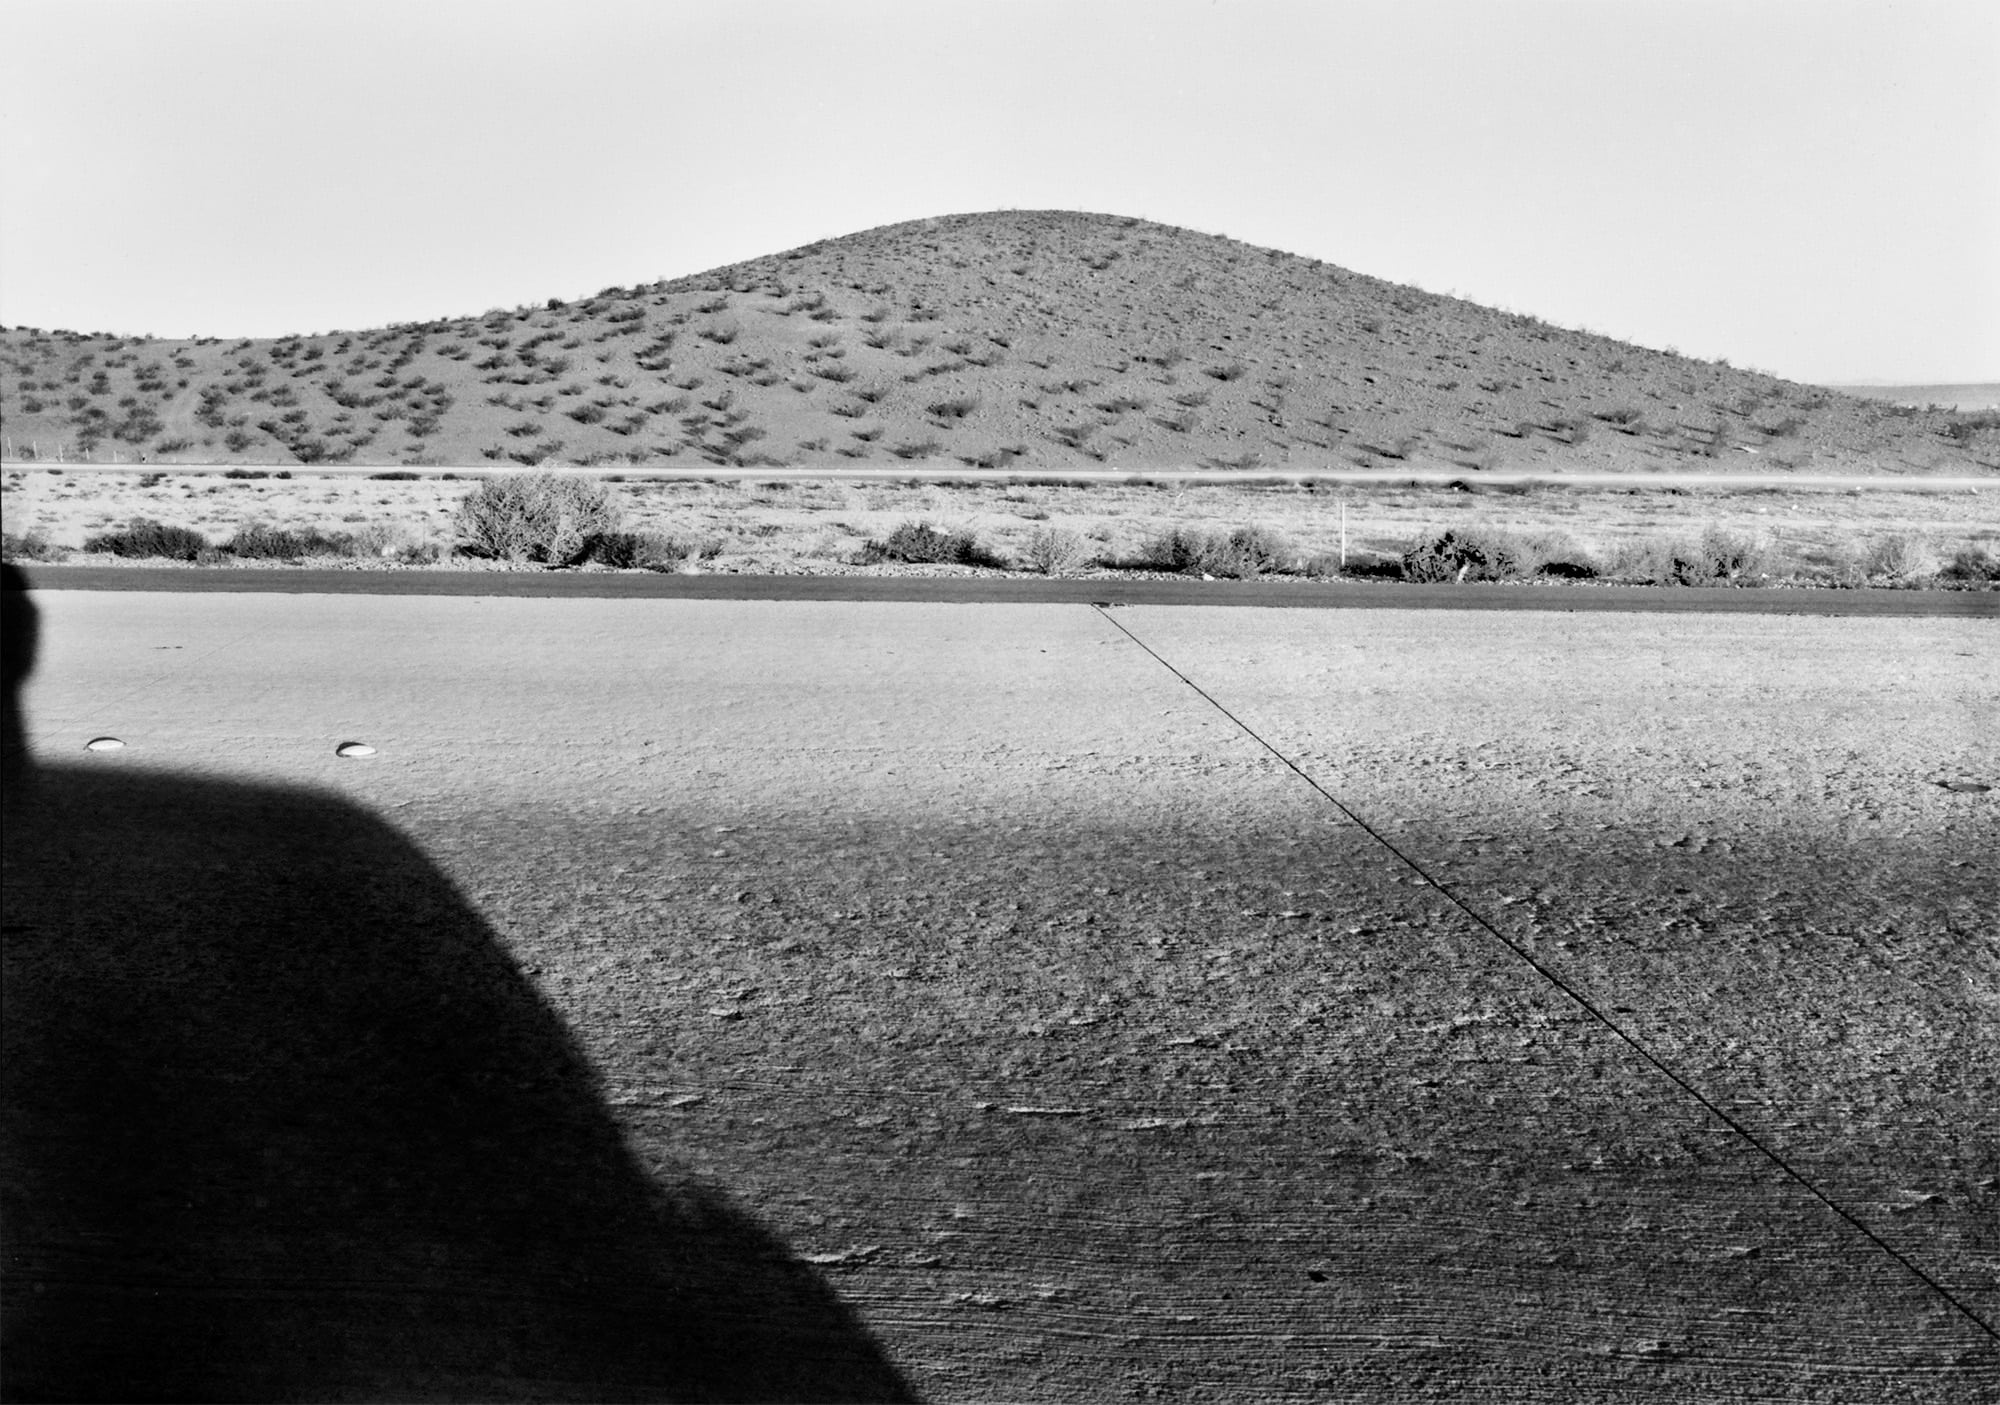 Interstate 5, California, USA 1975